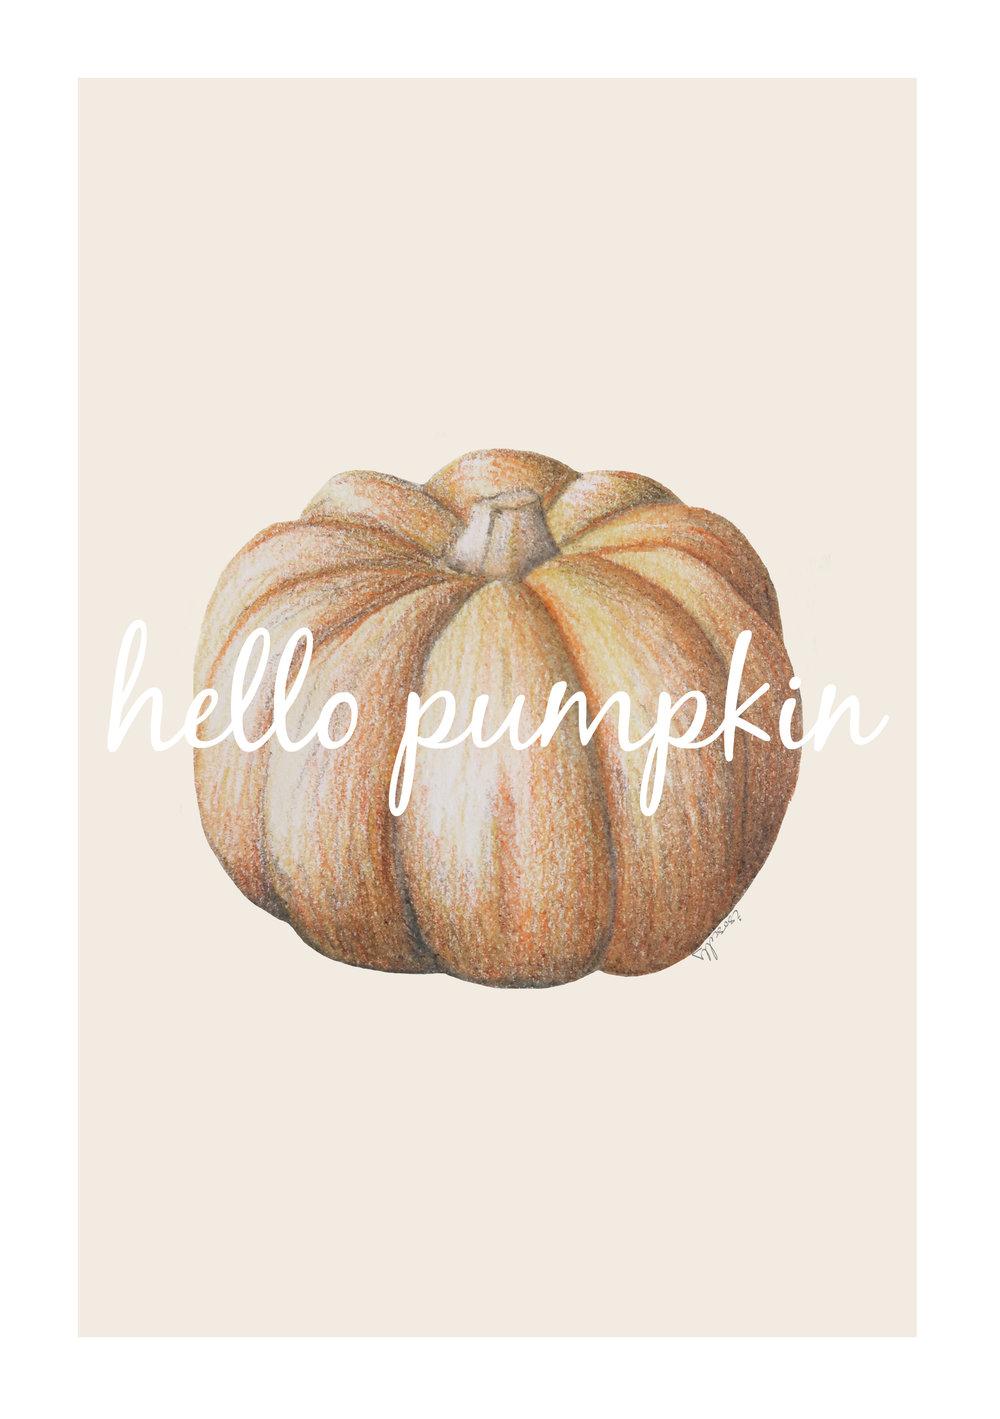 Printable Pumpkin Art Print by Isoscella.jpg